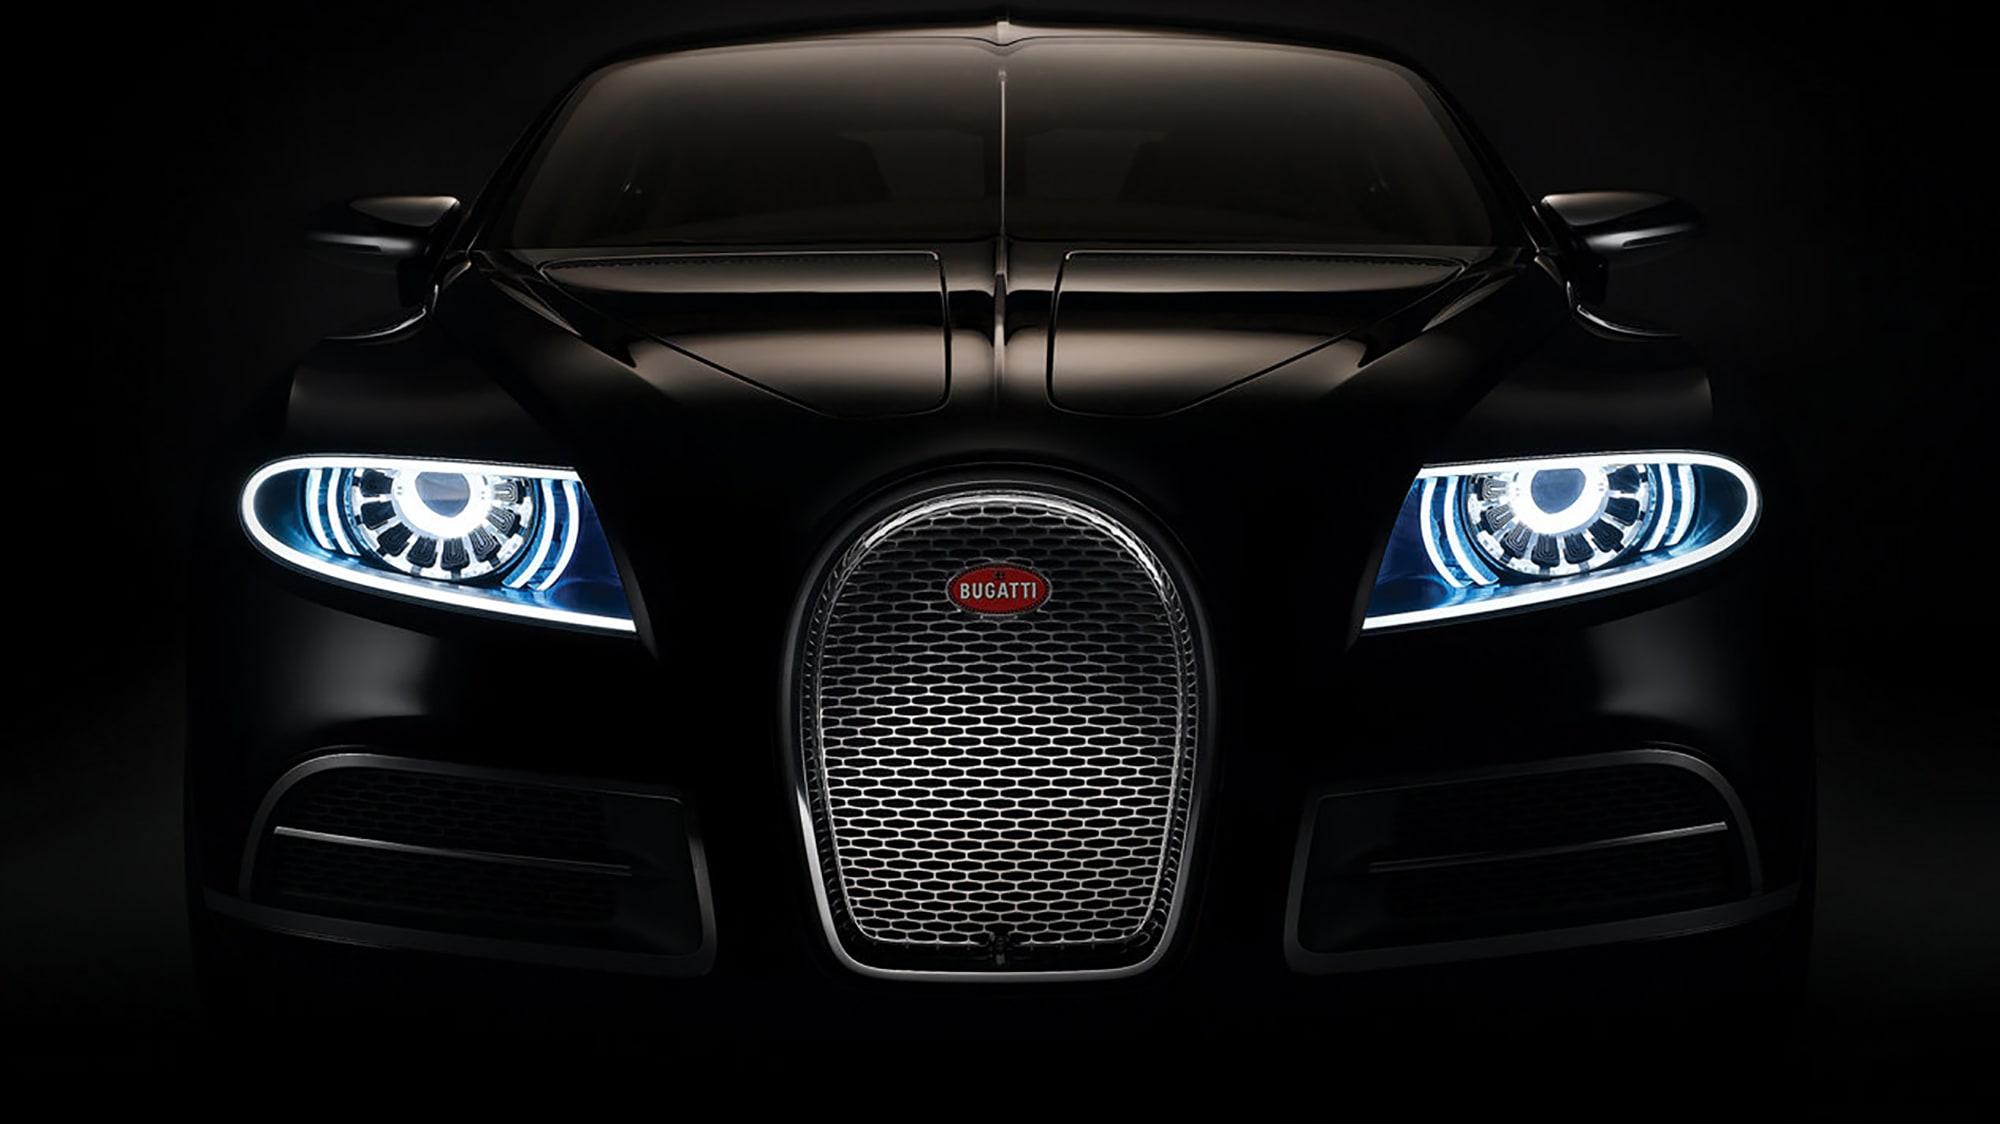 Bugatti mulling electric SUV - report - Cars news - NewsLocker